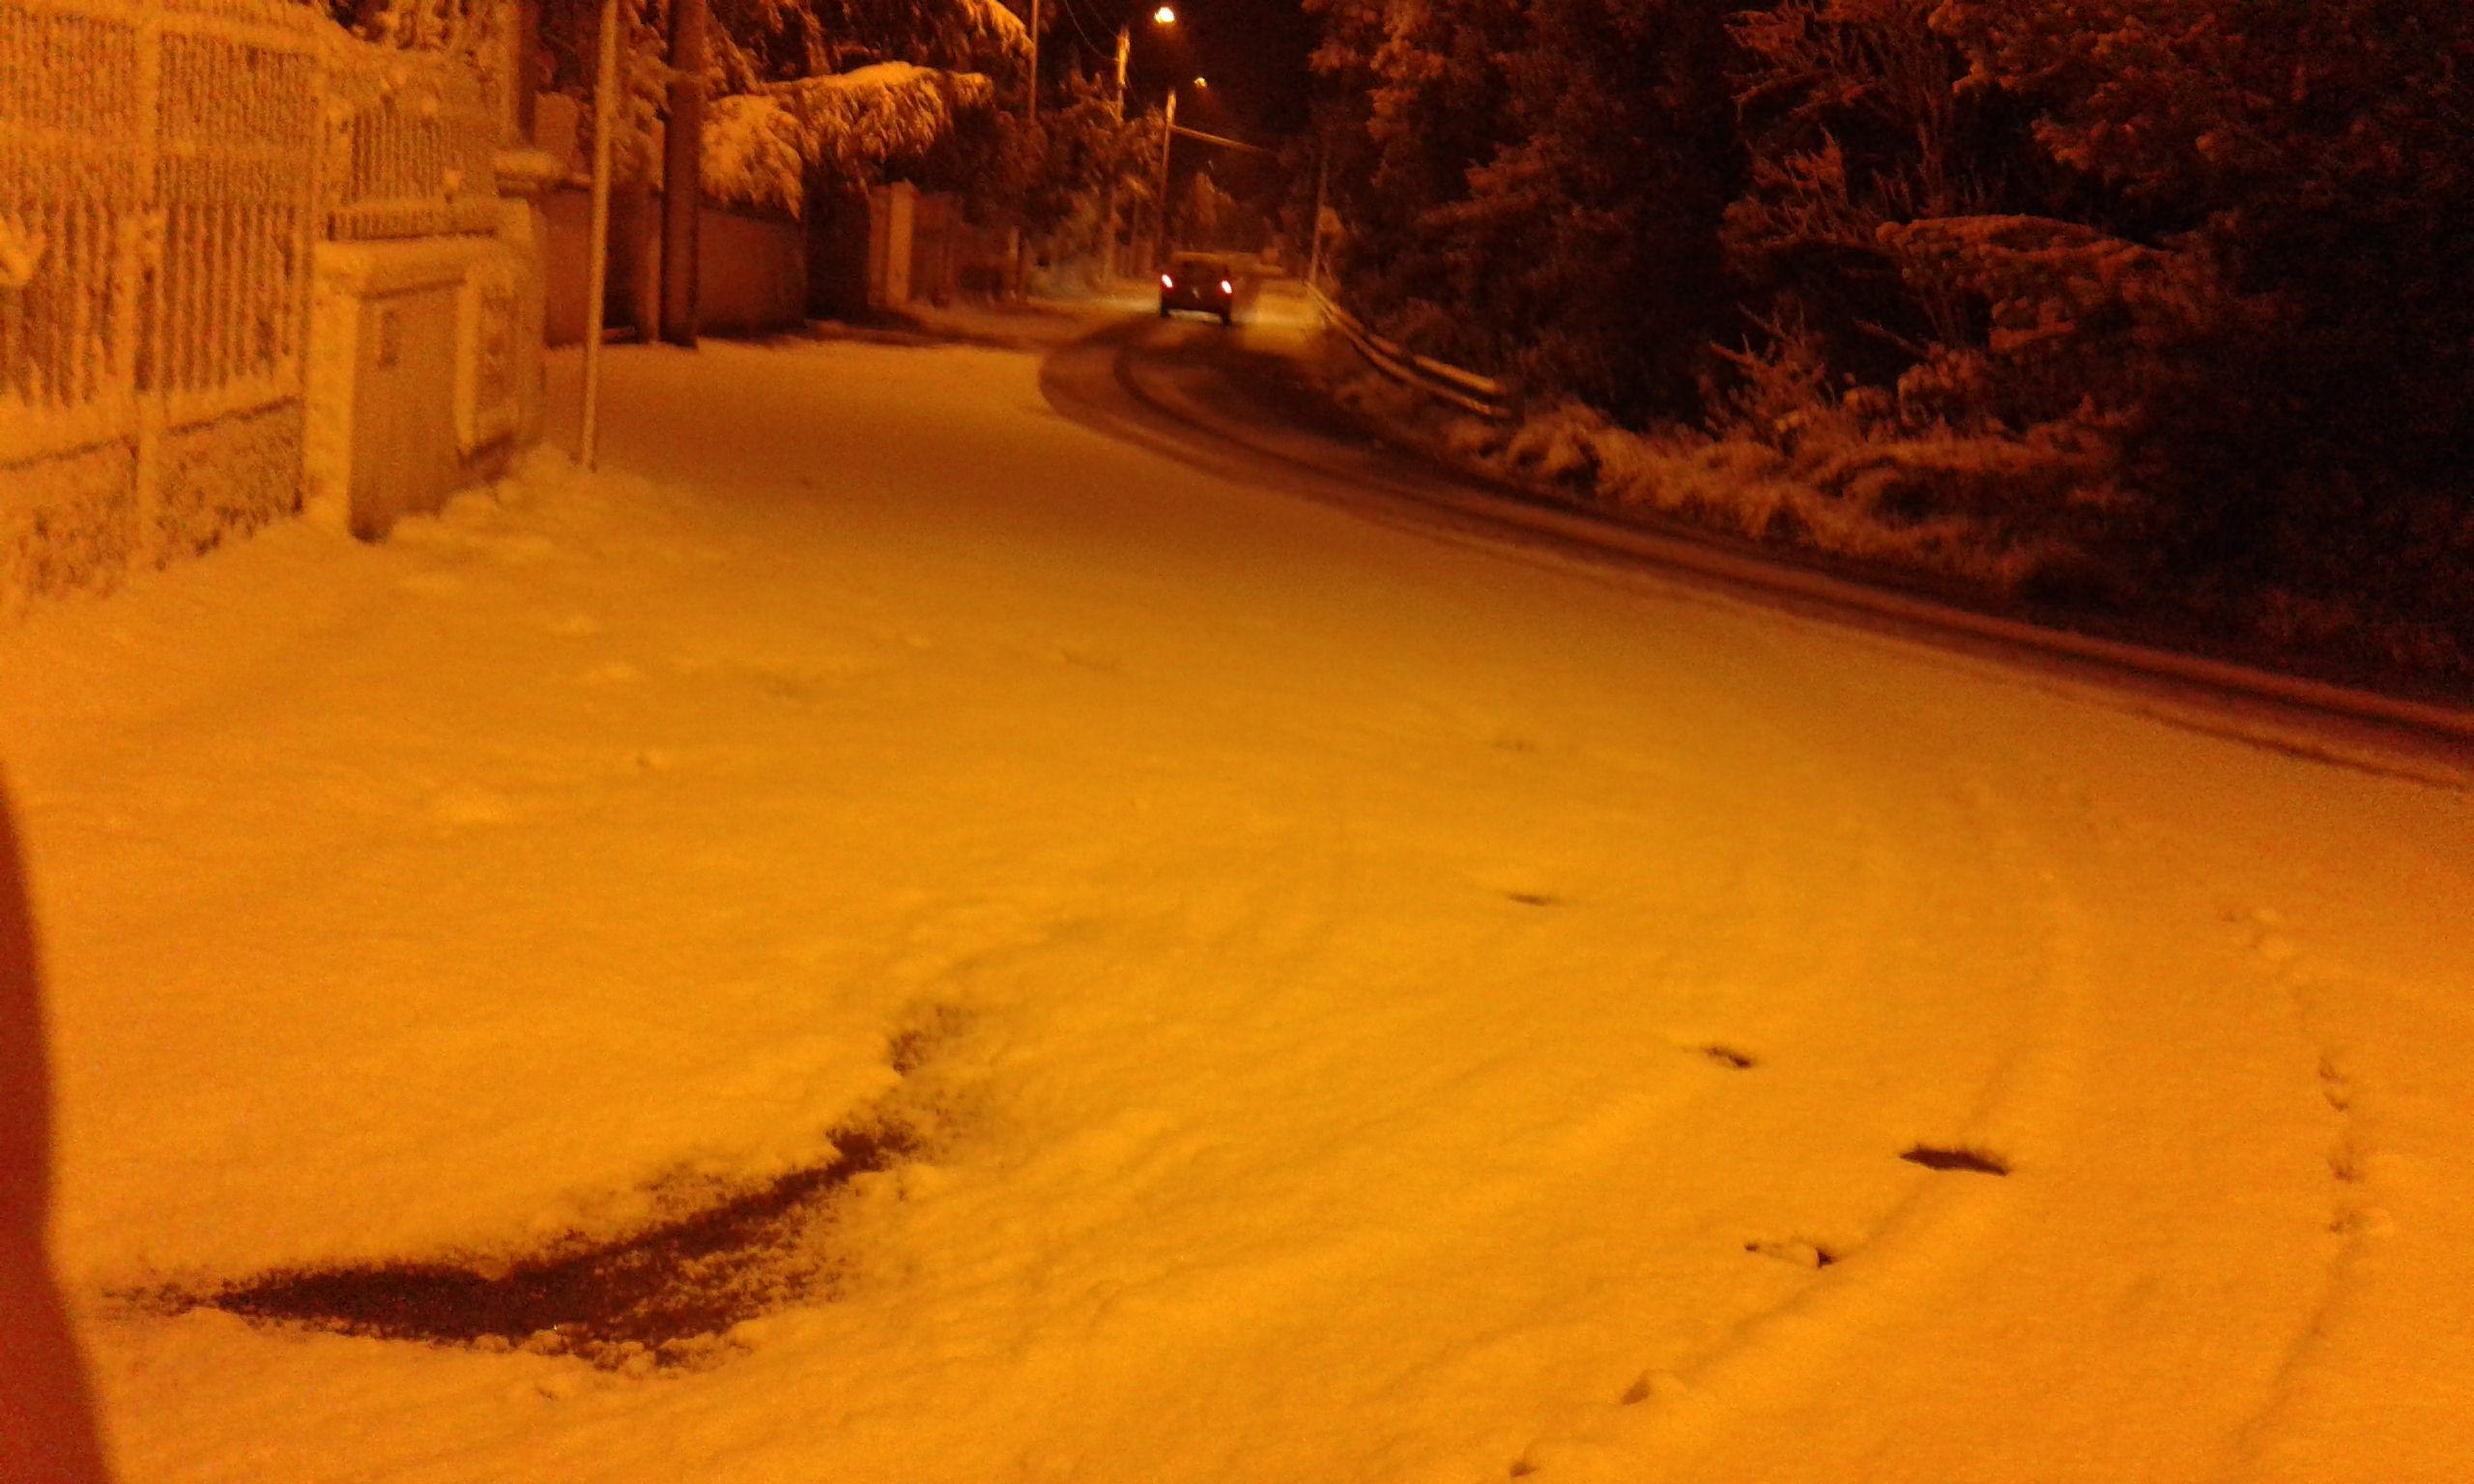 Gelo e neve d'Epifania 2017_qui tutte le FOTO e i VIDEO-img-20170106-wa0375.jpeg